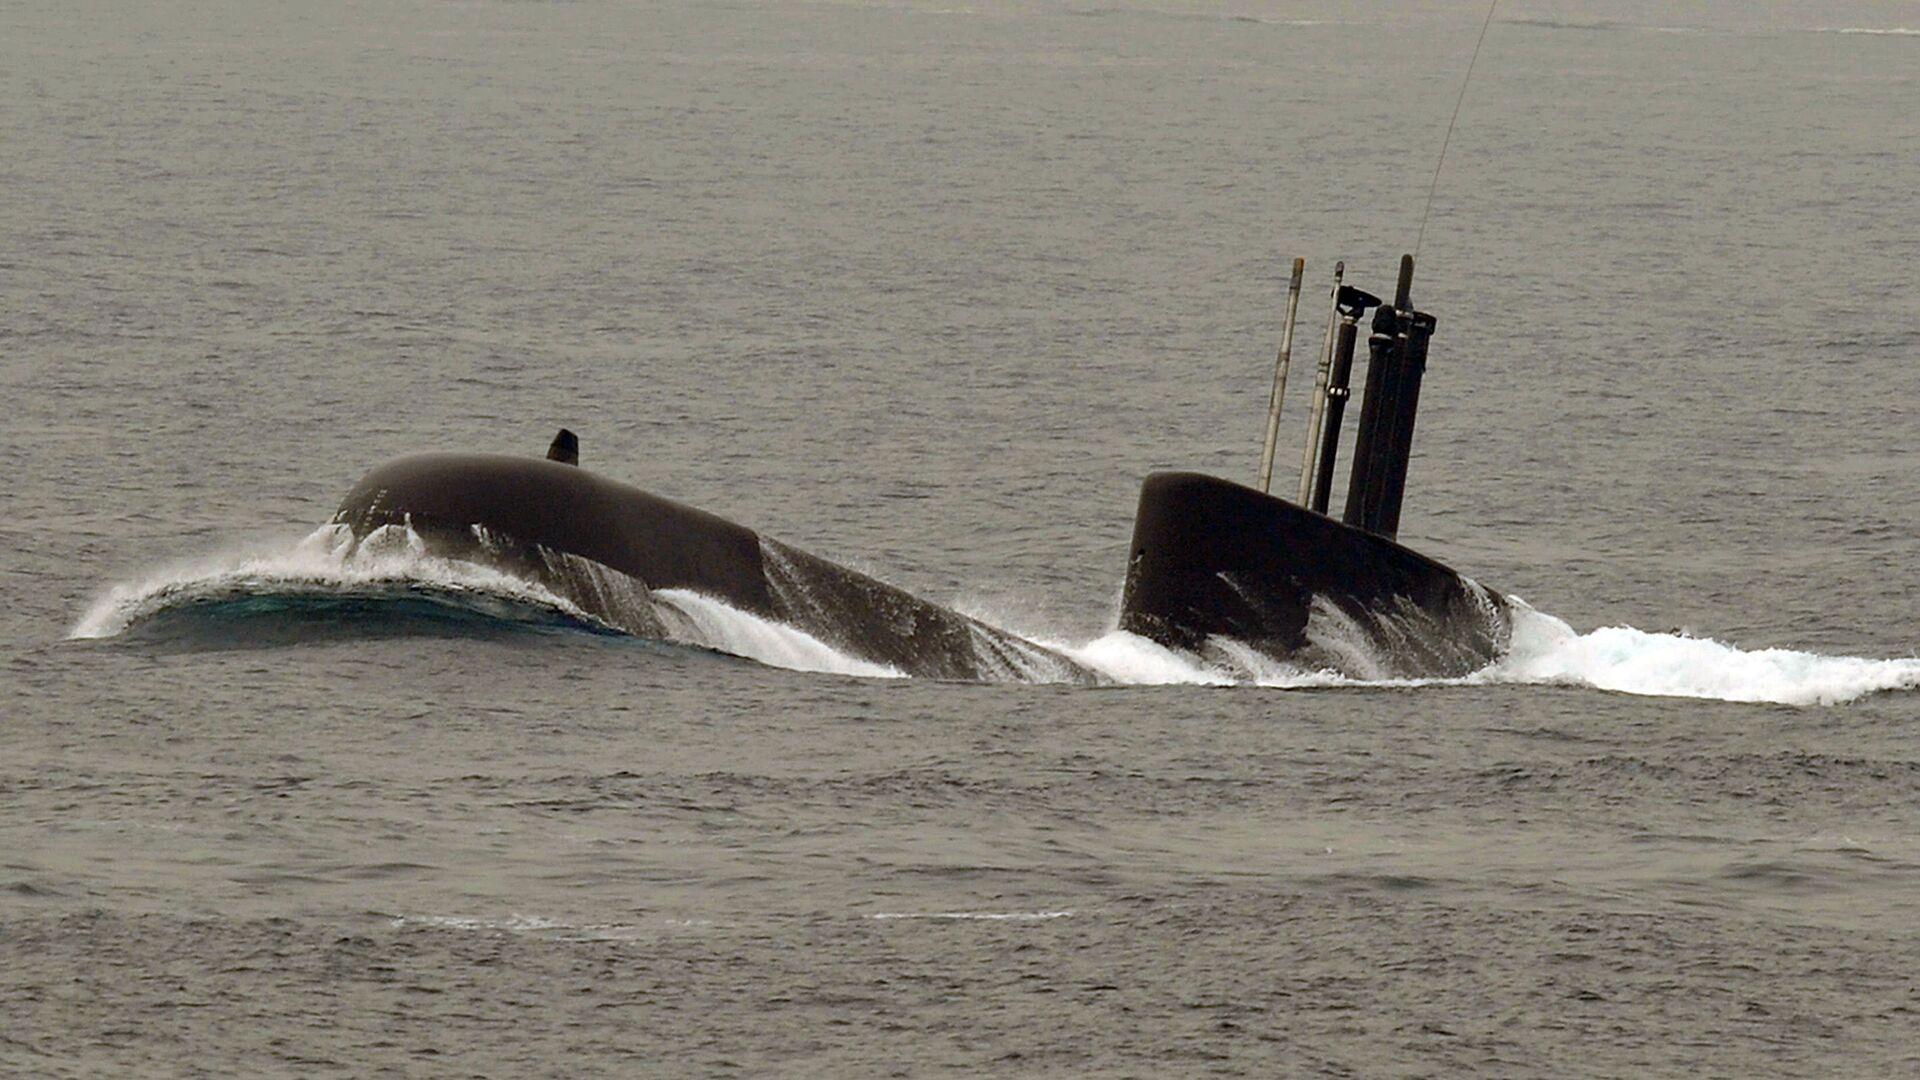 South Korean Navy's 209 class submarine - Sputnik International, 1920, 15.09.2021